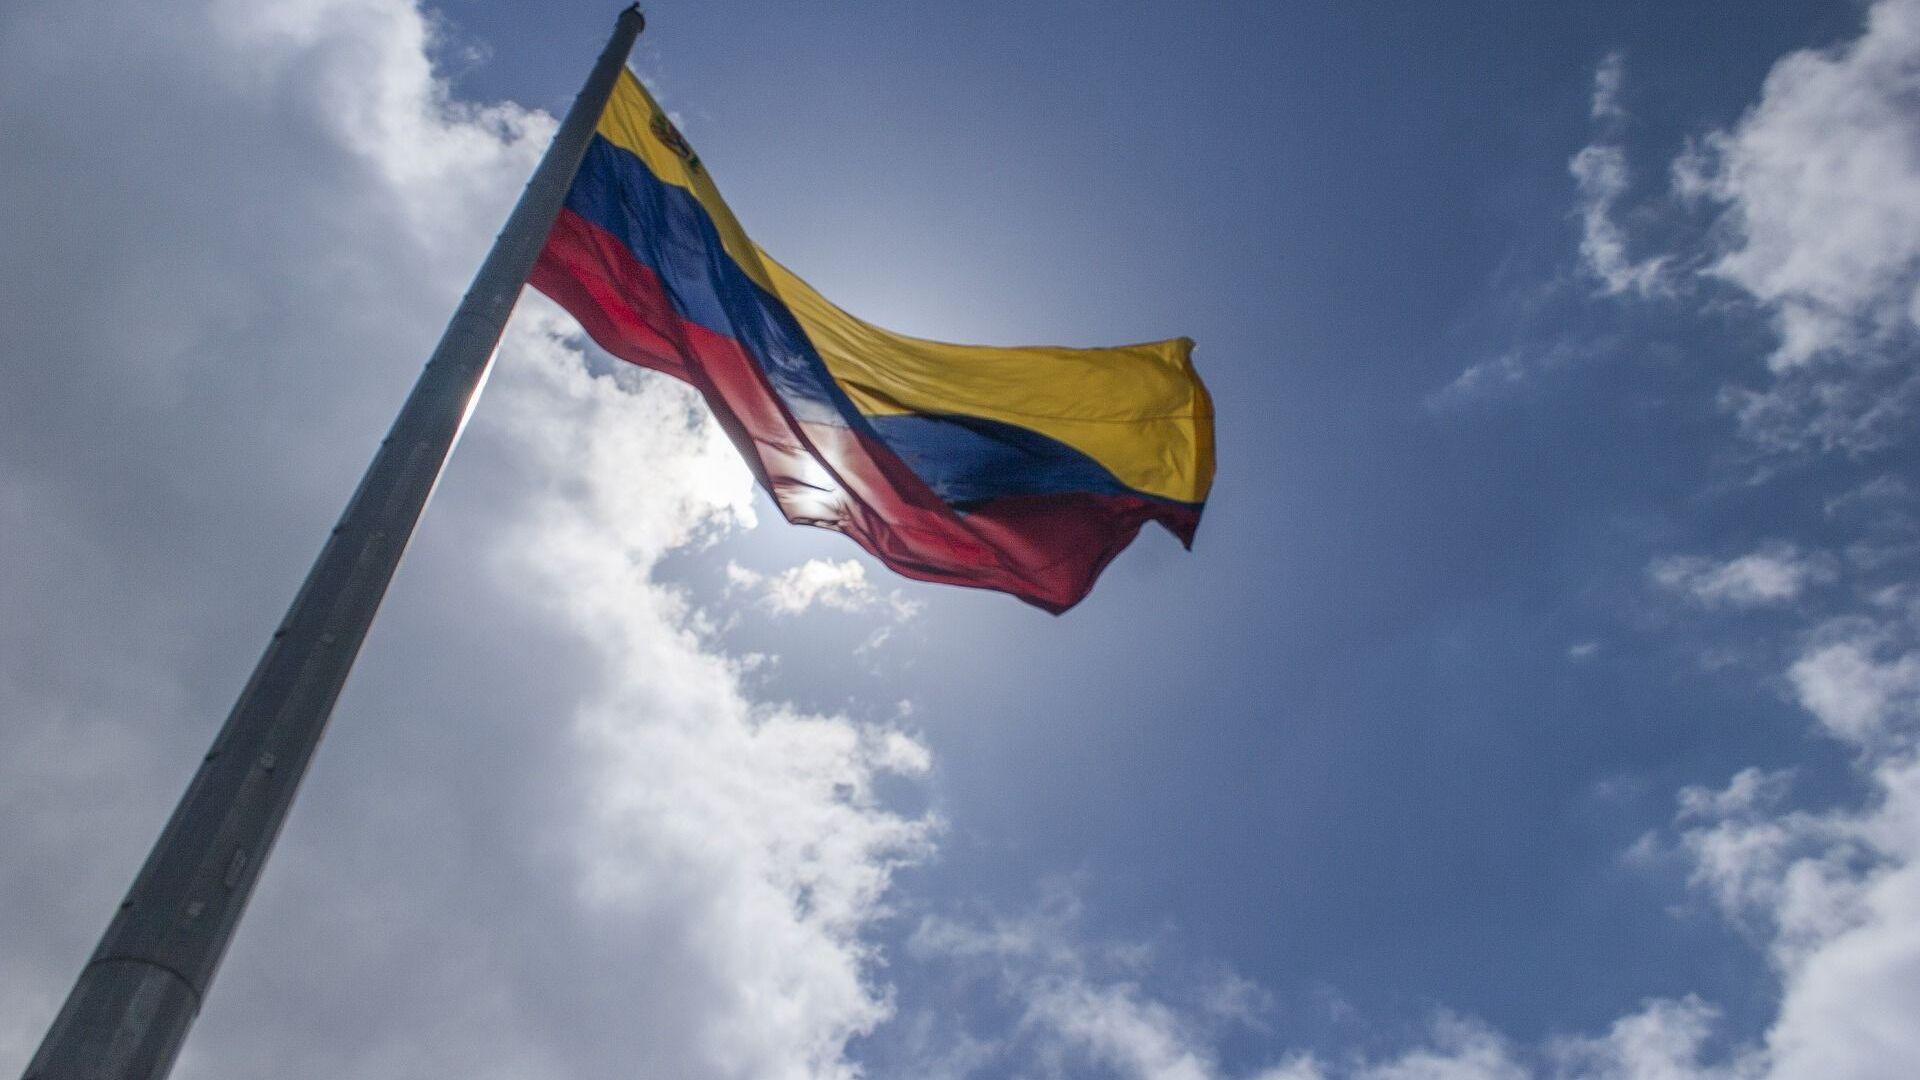 Bandera de Venezuela - Sputnik Mundo, 1920, 24.02.2021